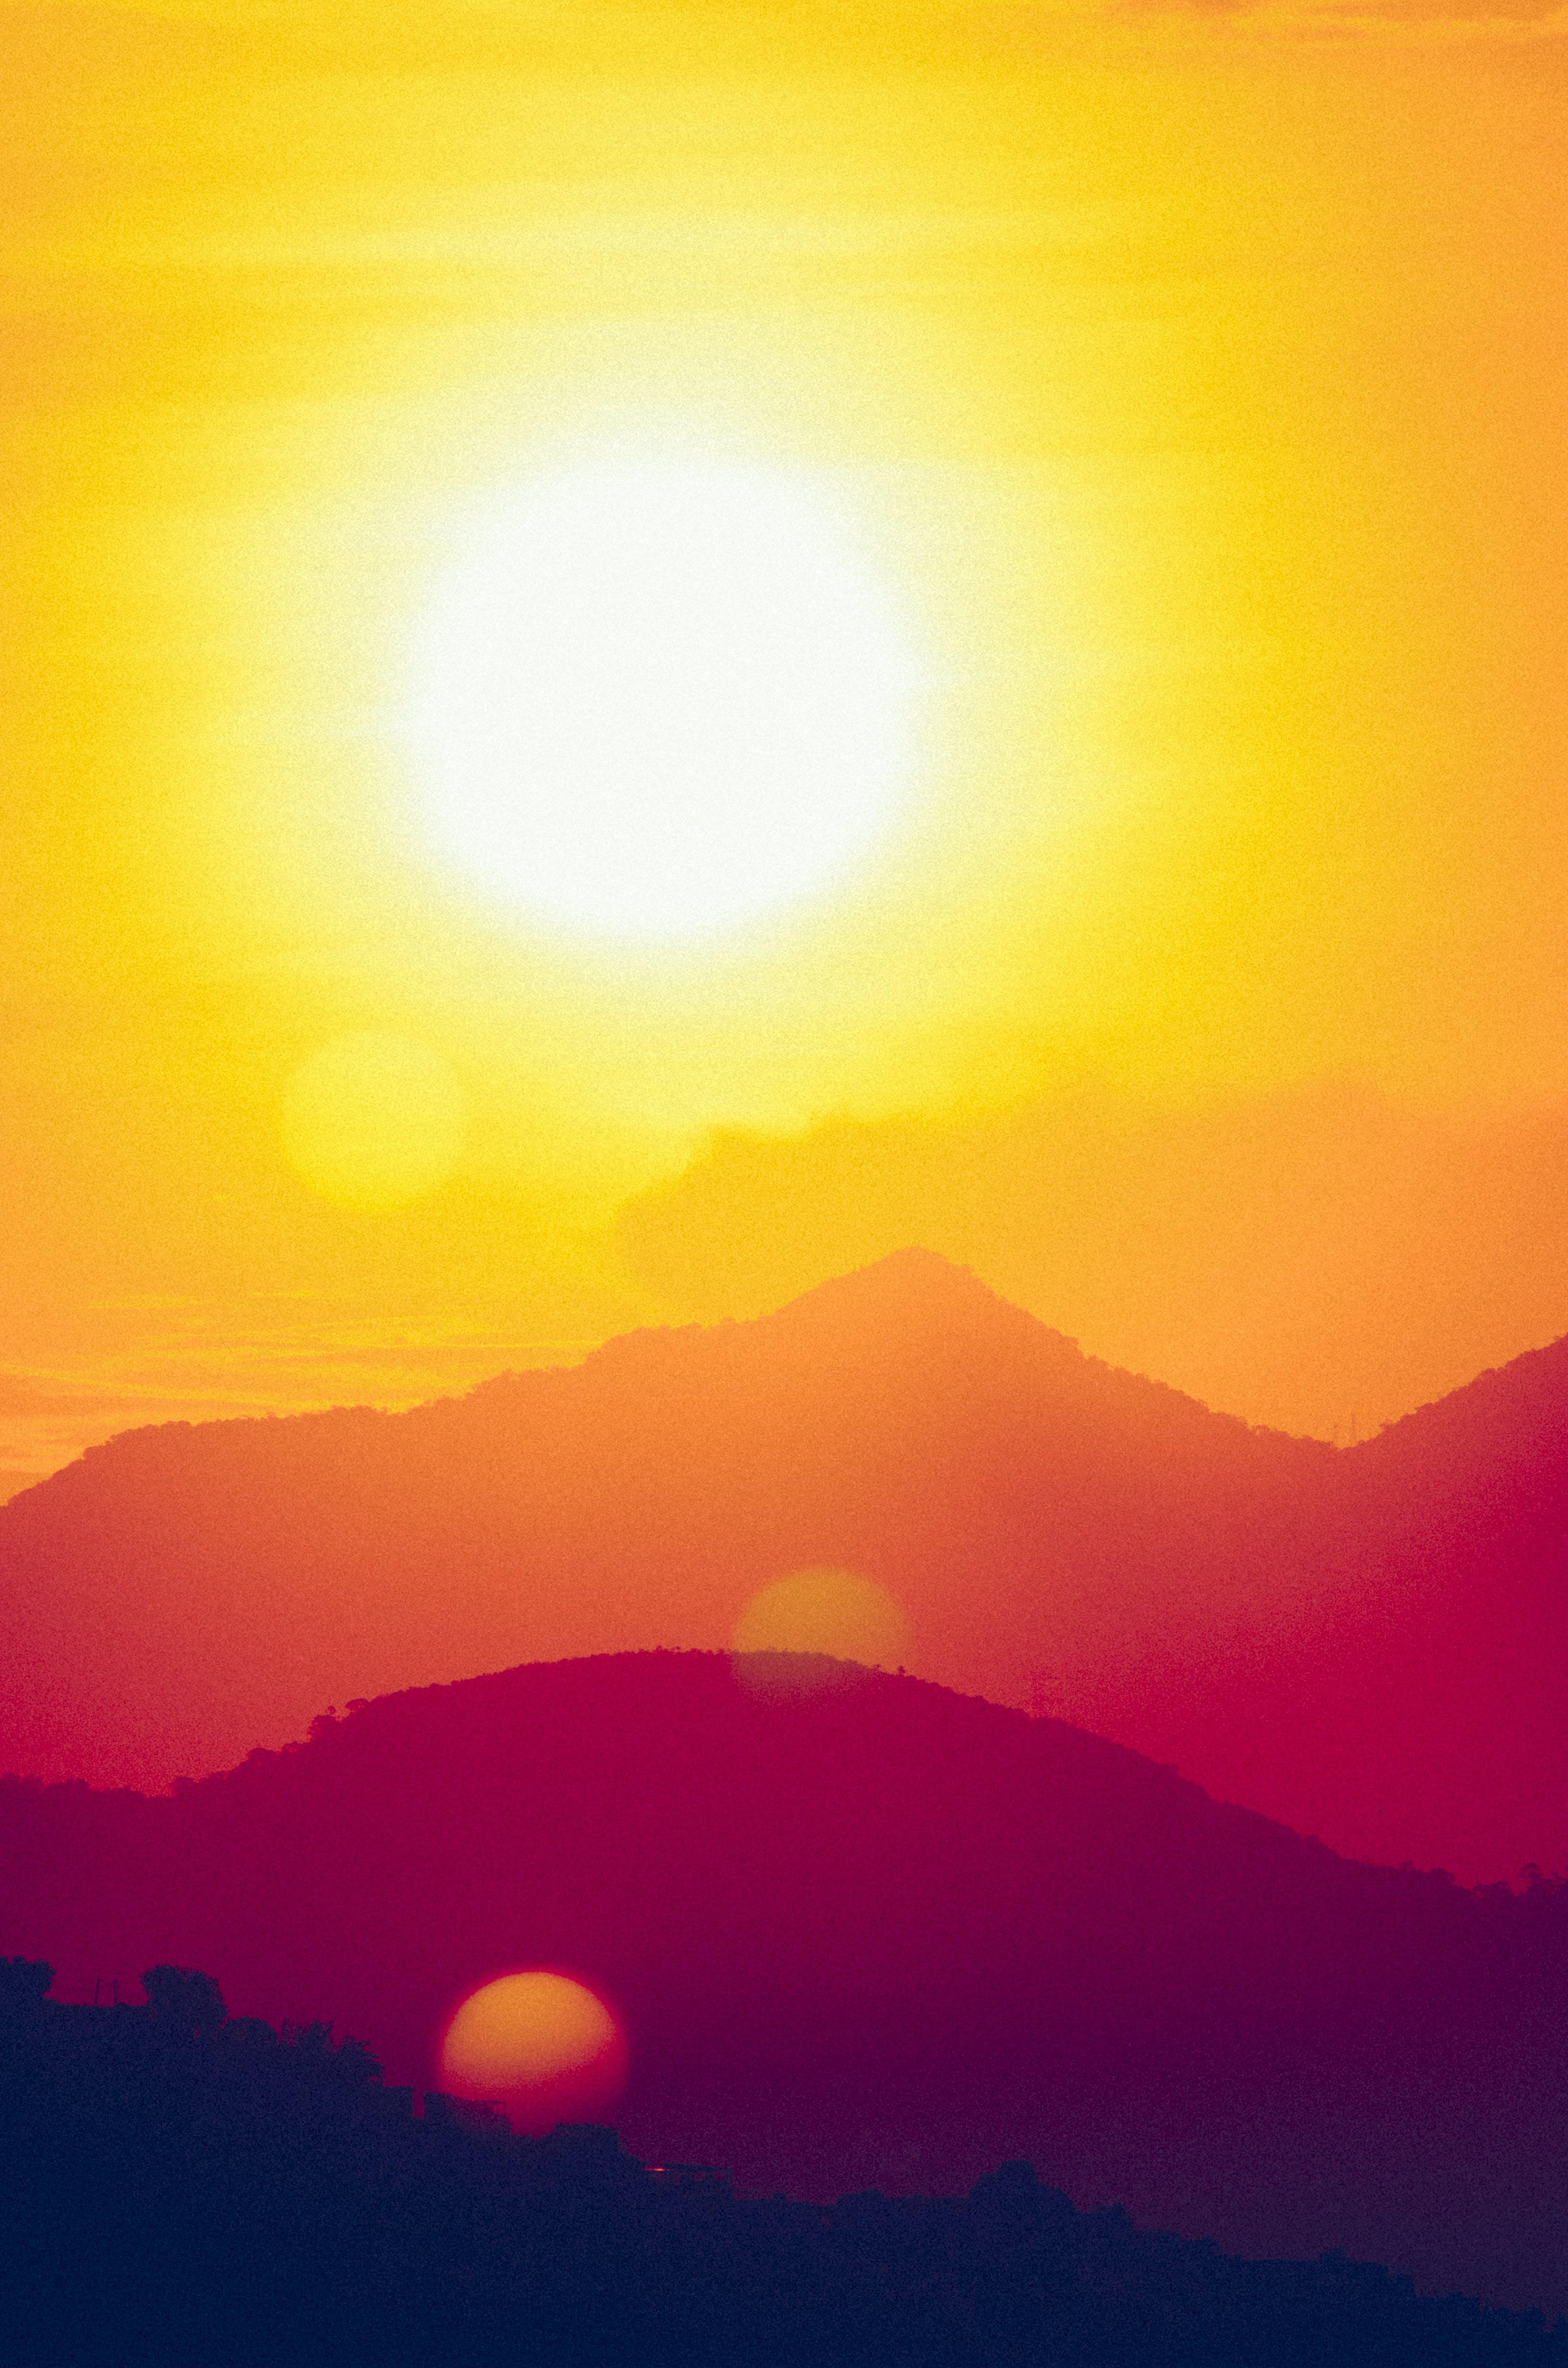 Free stock photo of landscape, sunset, golden, golden hour